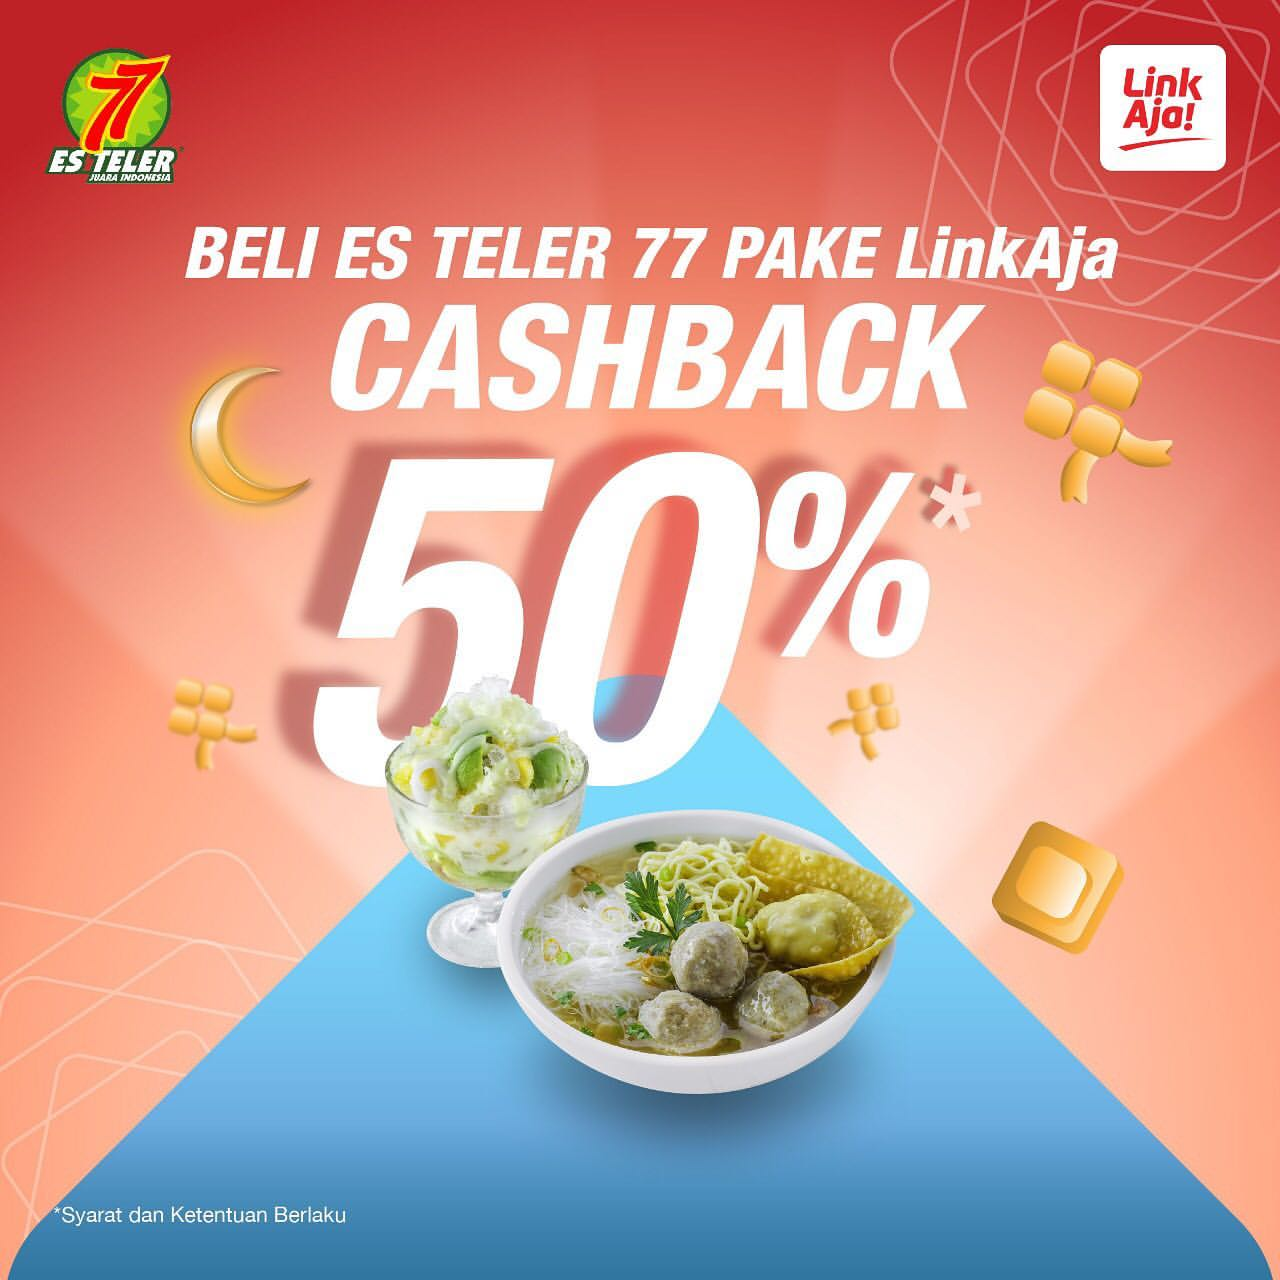 ES TELER Promo Cashback 50% dengan LinkAja